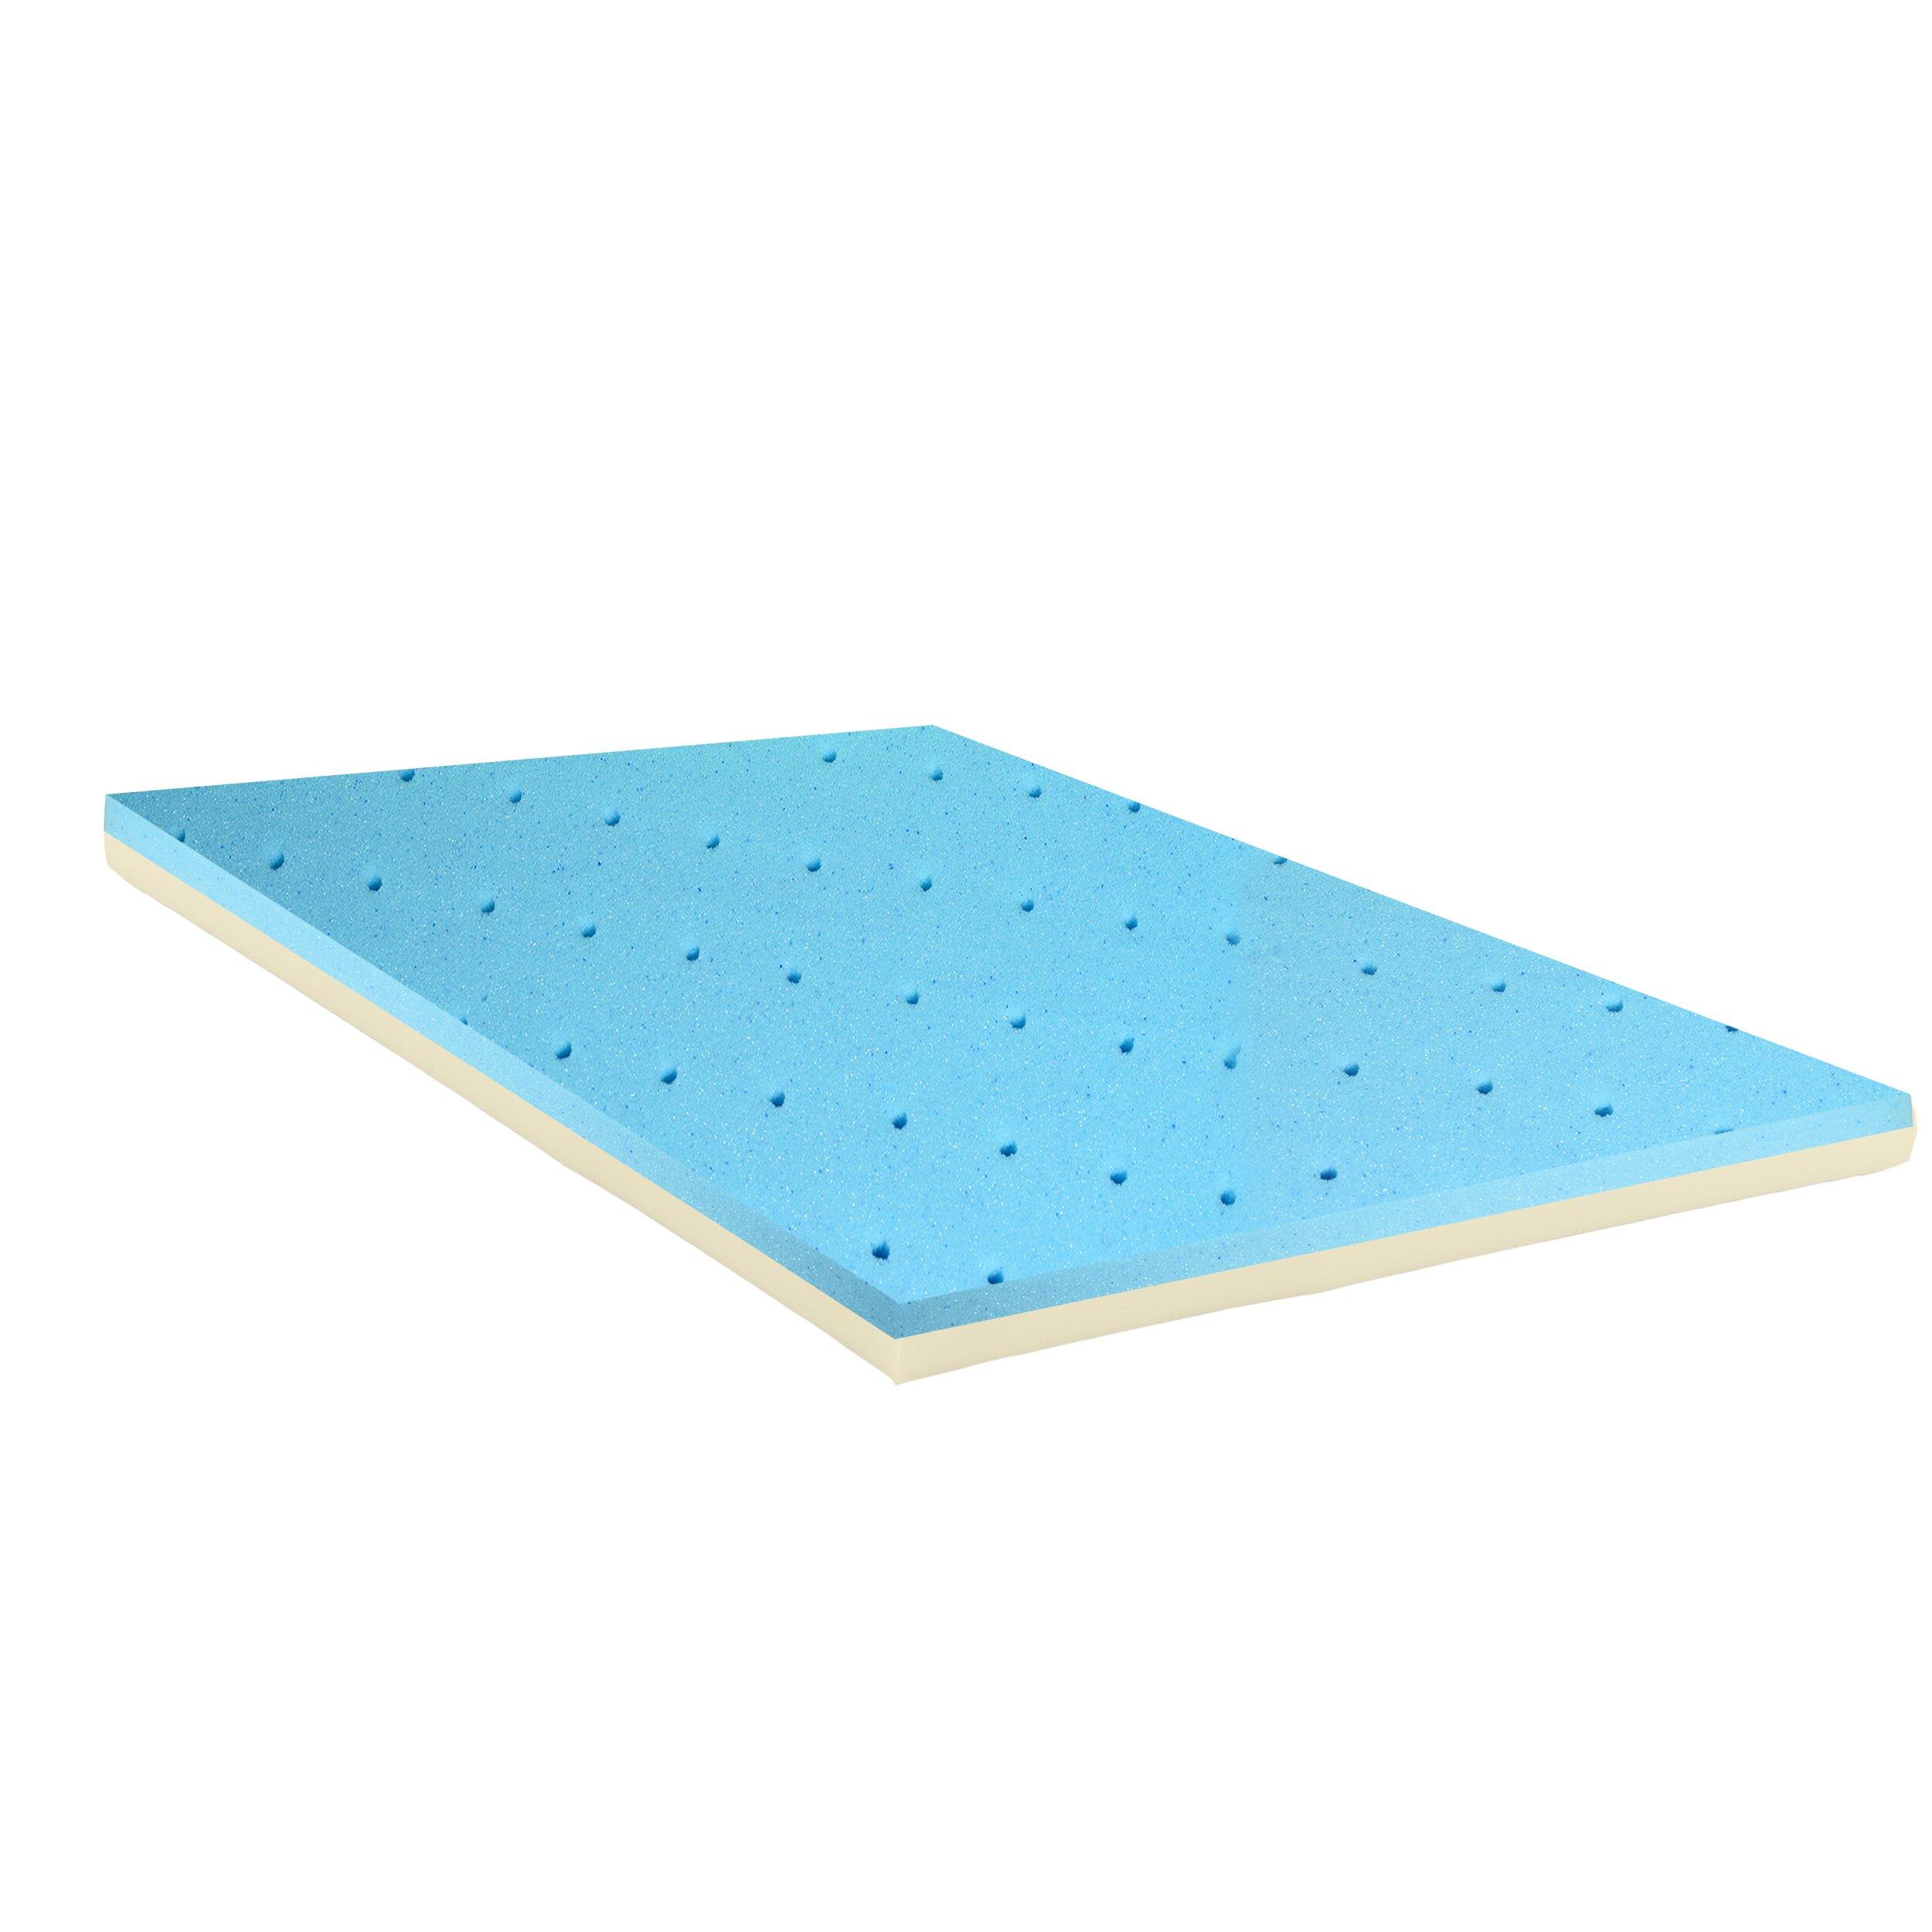 Spinal Solution Gel Infused High Density Foam Mattress Topper Reviews Wayfair